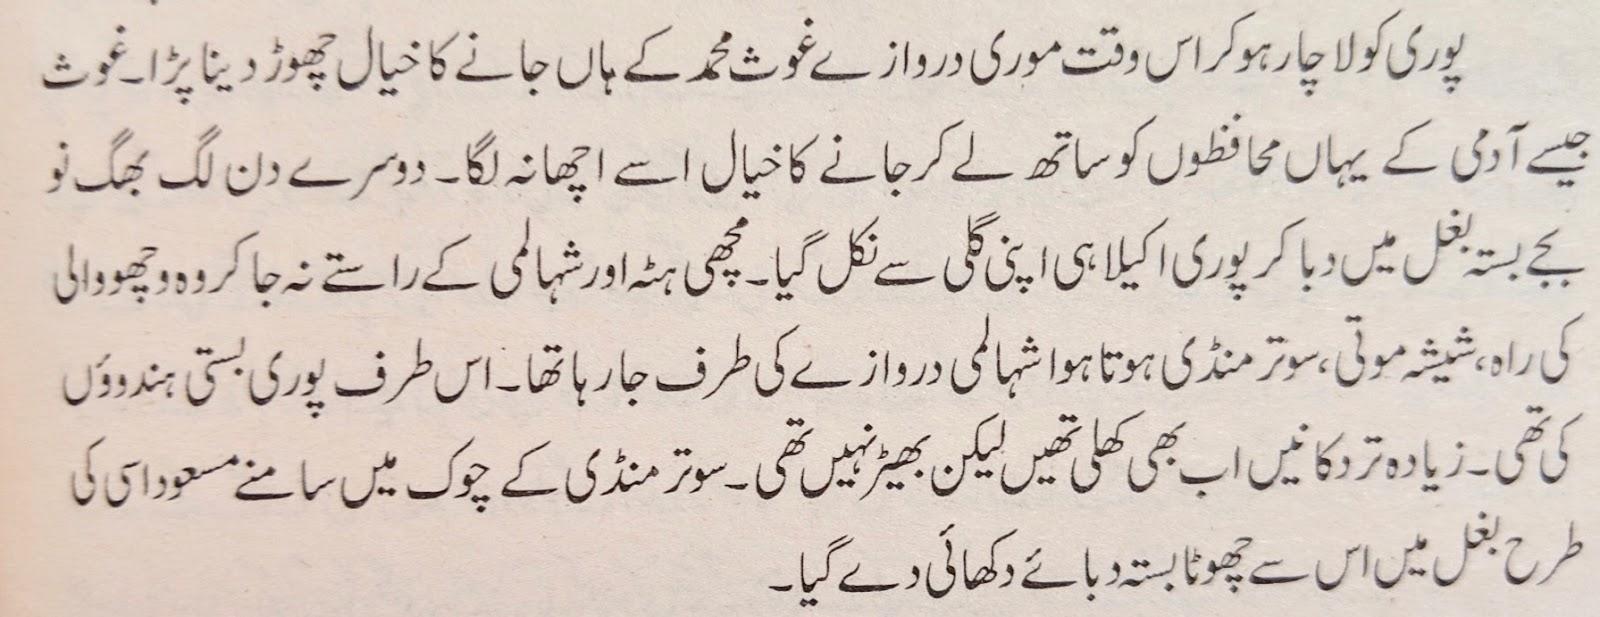 Ghareebkhana: Jhoota Sach (This Is Not That Dawn): By Yashpal  A